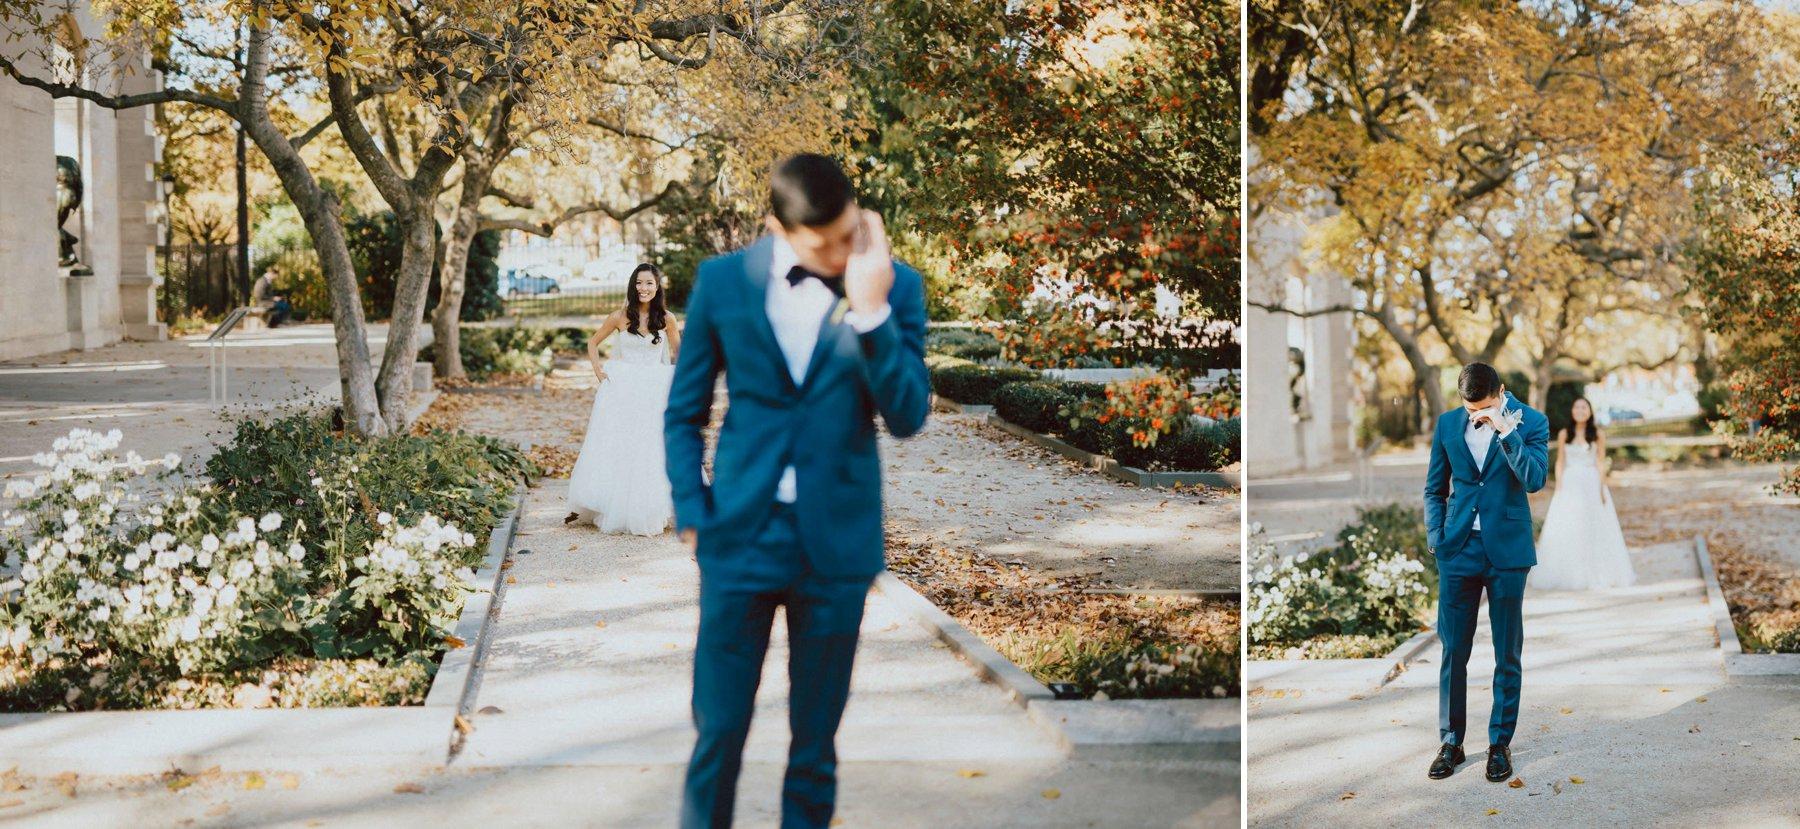 philadelphia-wedding-photographer-38.jpg